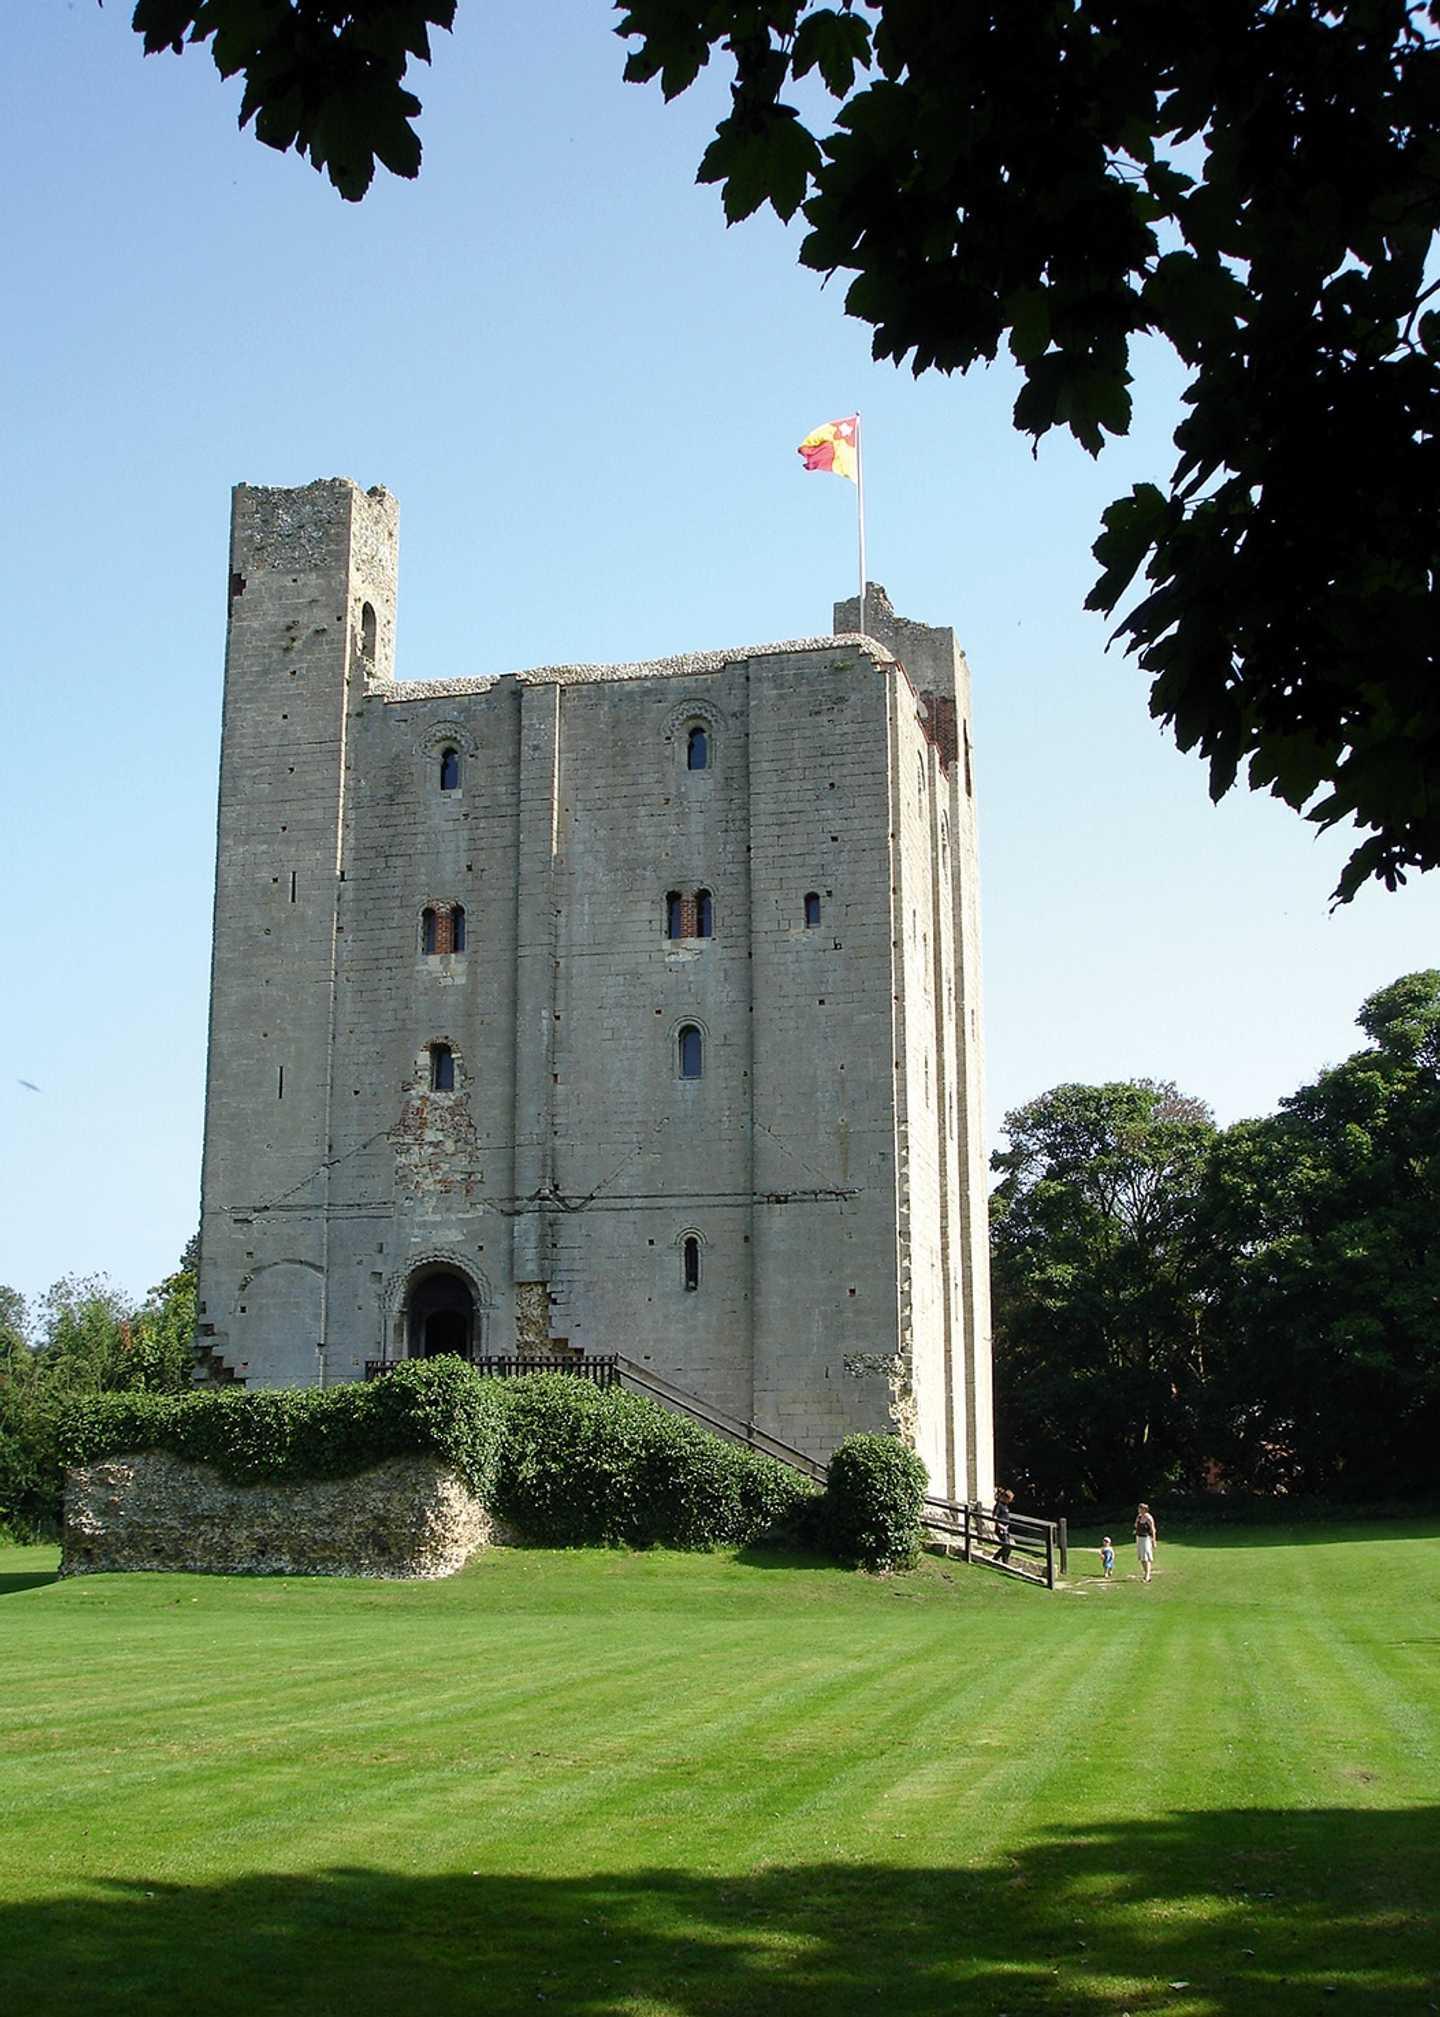 Exterior of Hedingham Castle